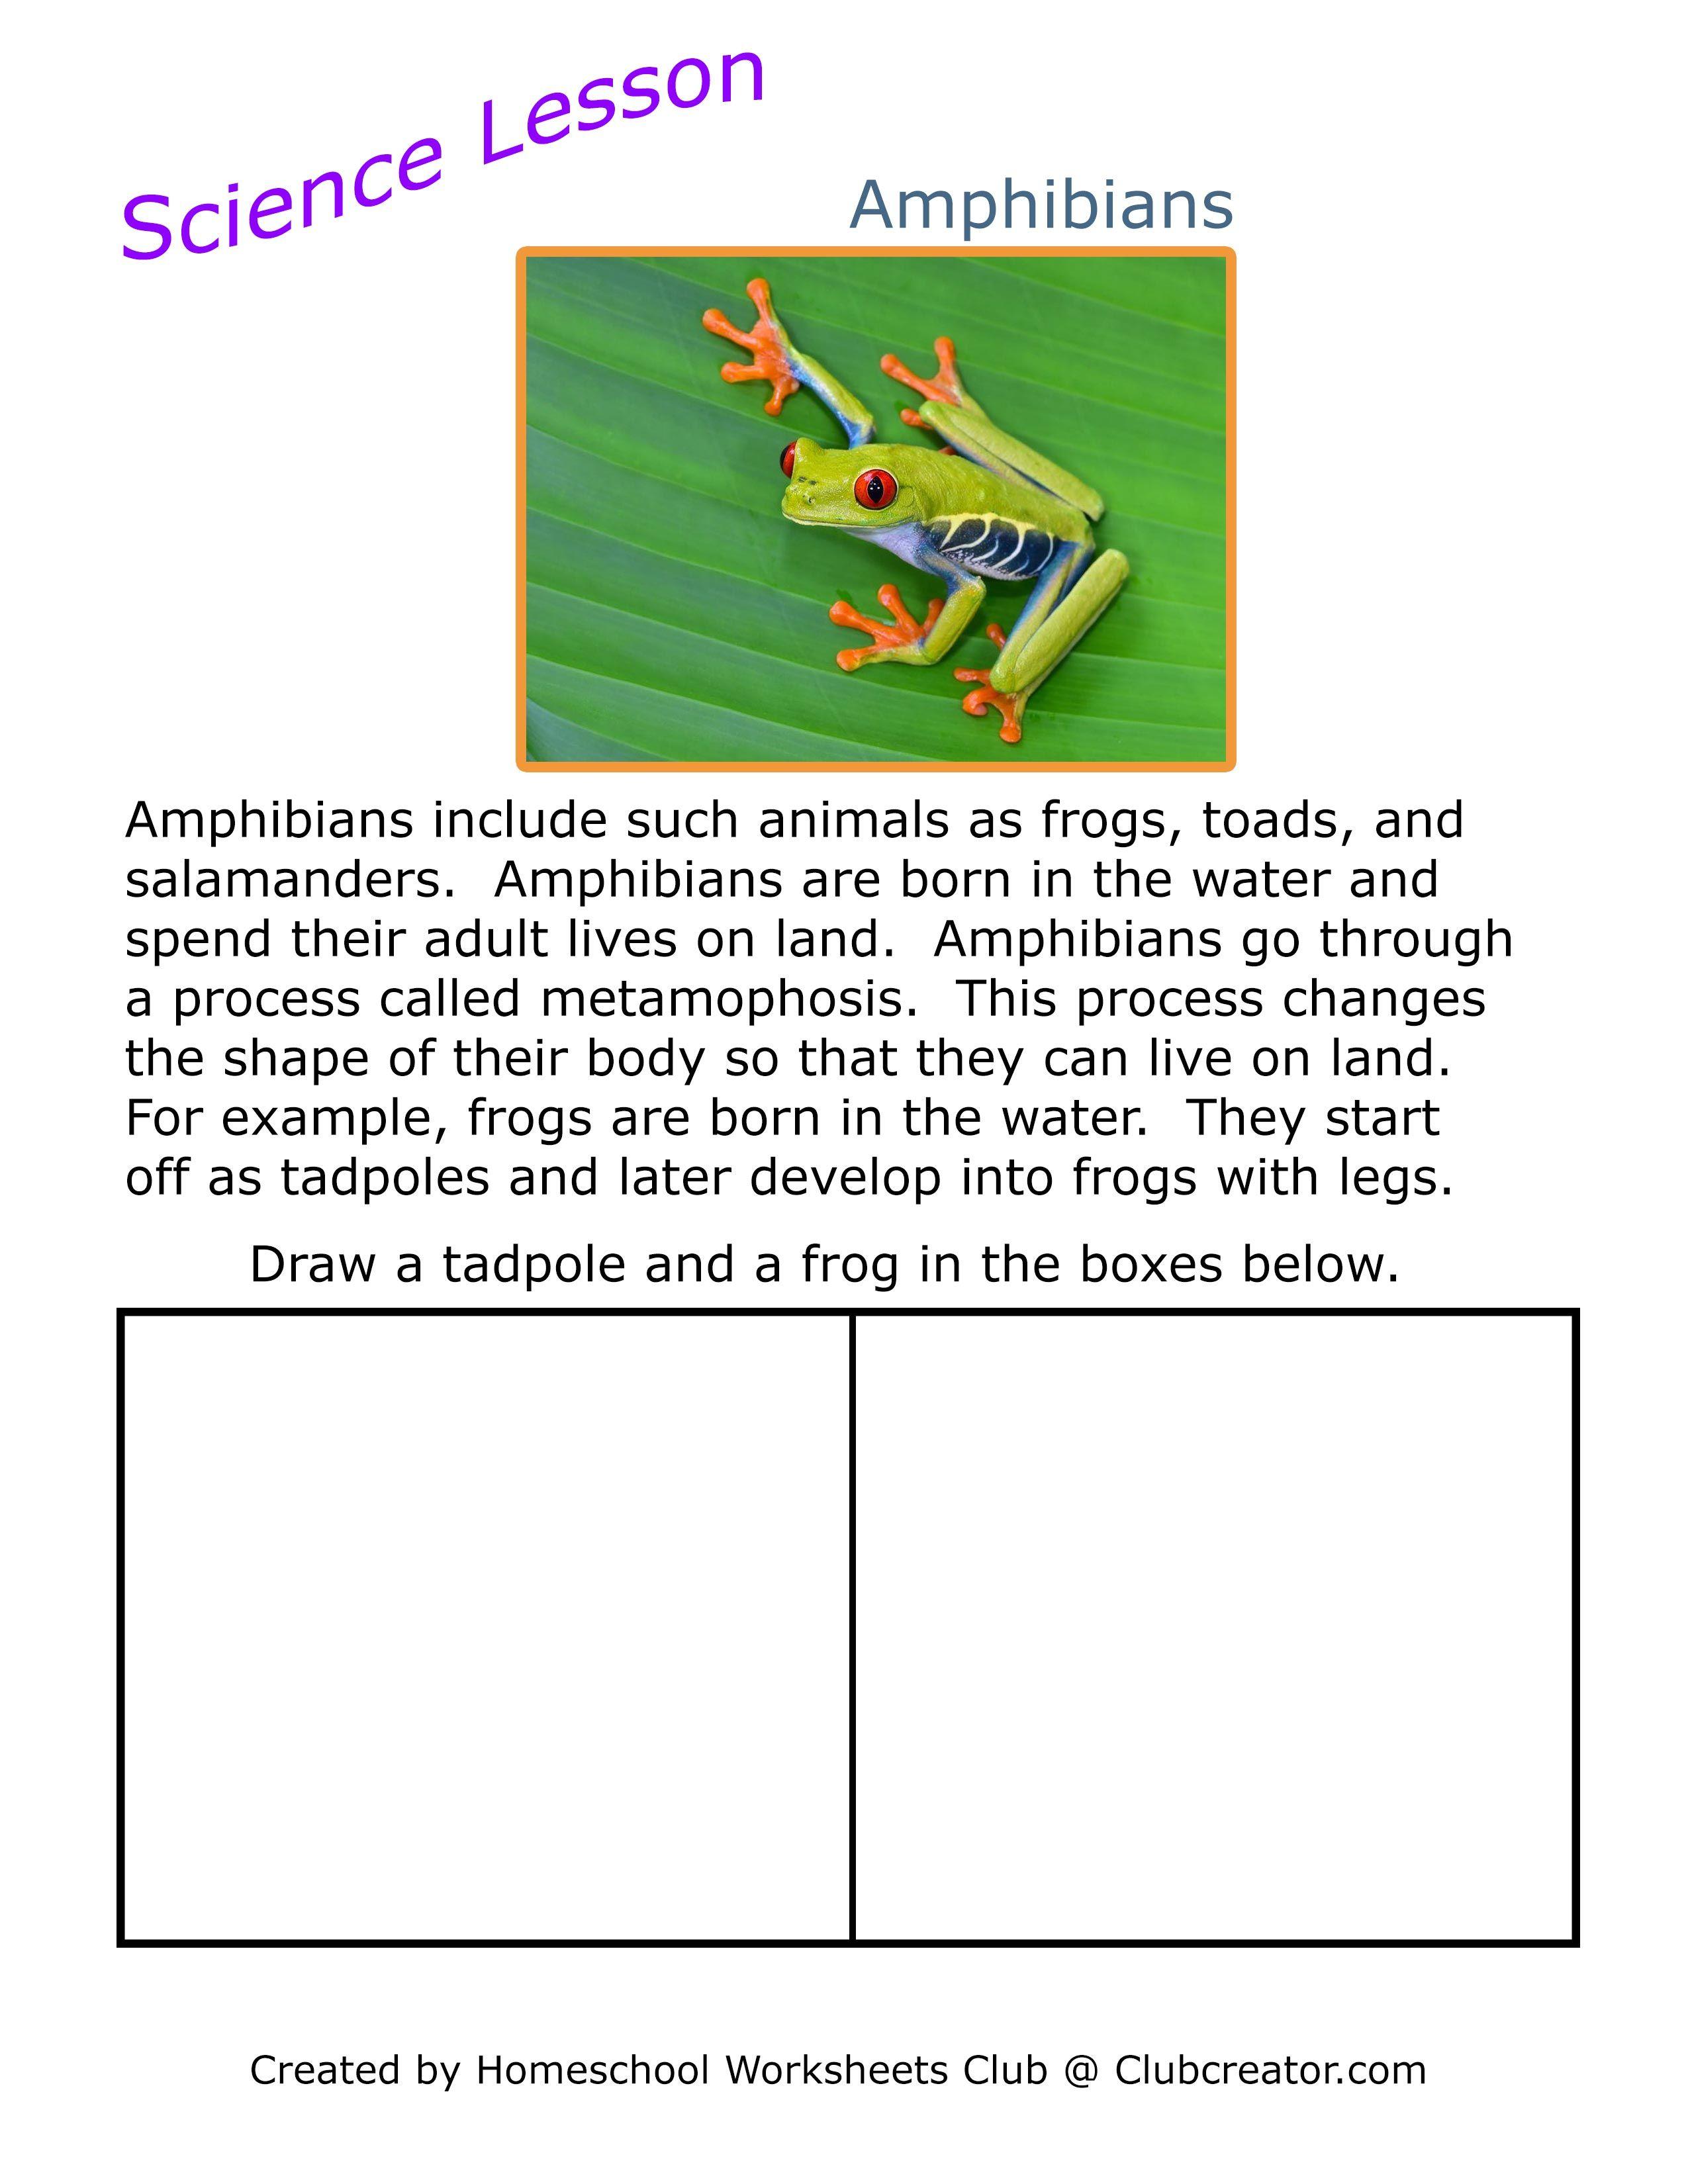 Science Amphibians Worksheet In